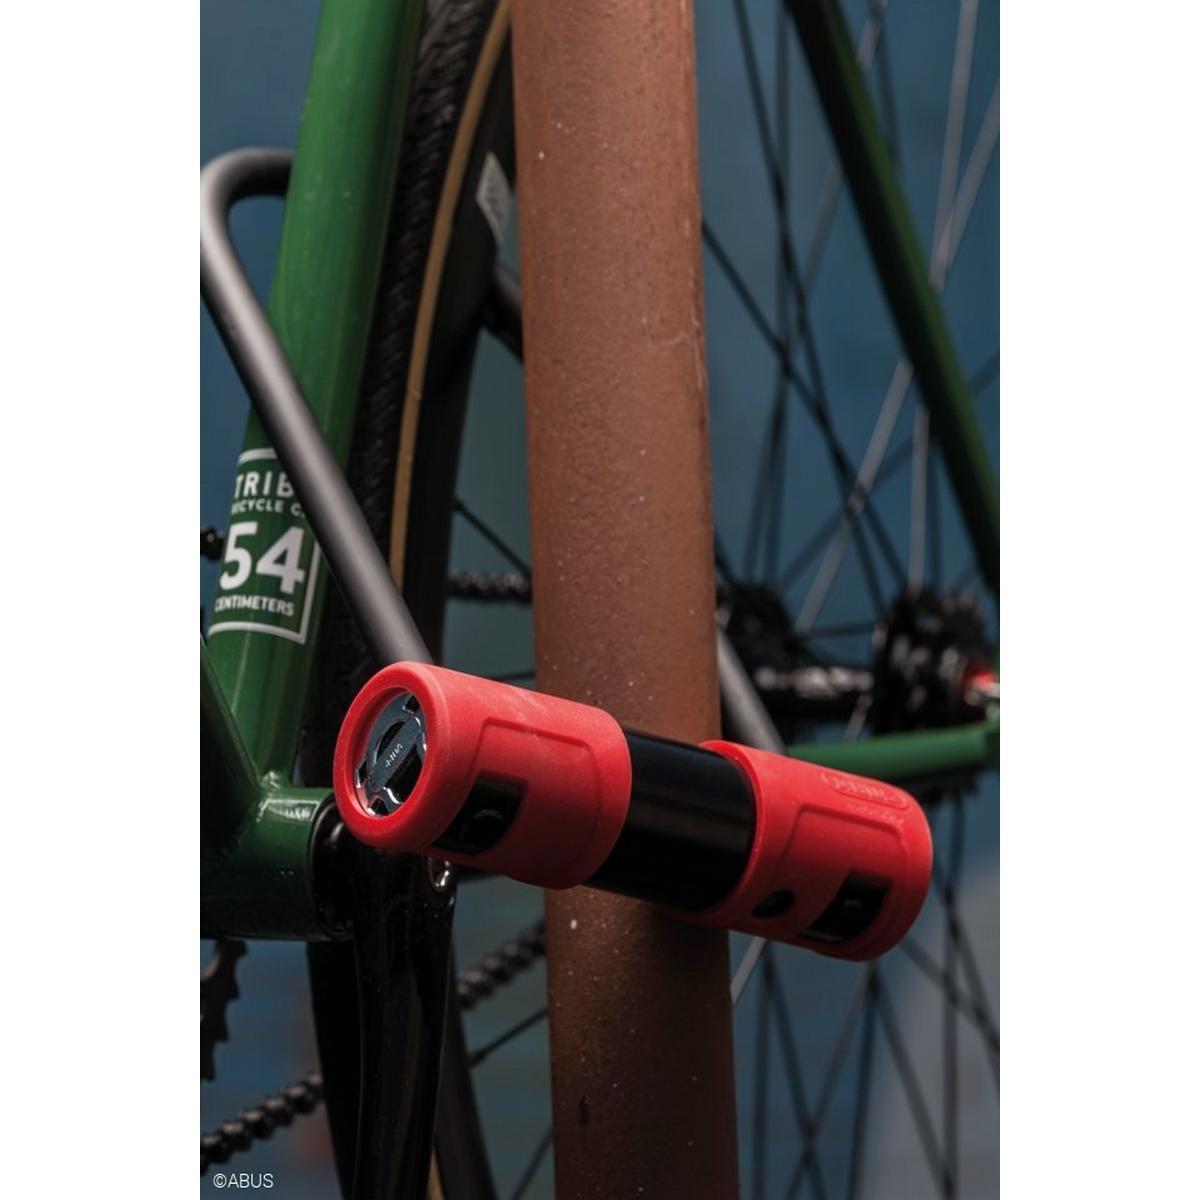 Abus D-Lock 440 Alarm Bike Lock